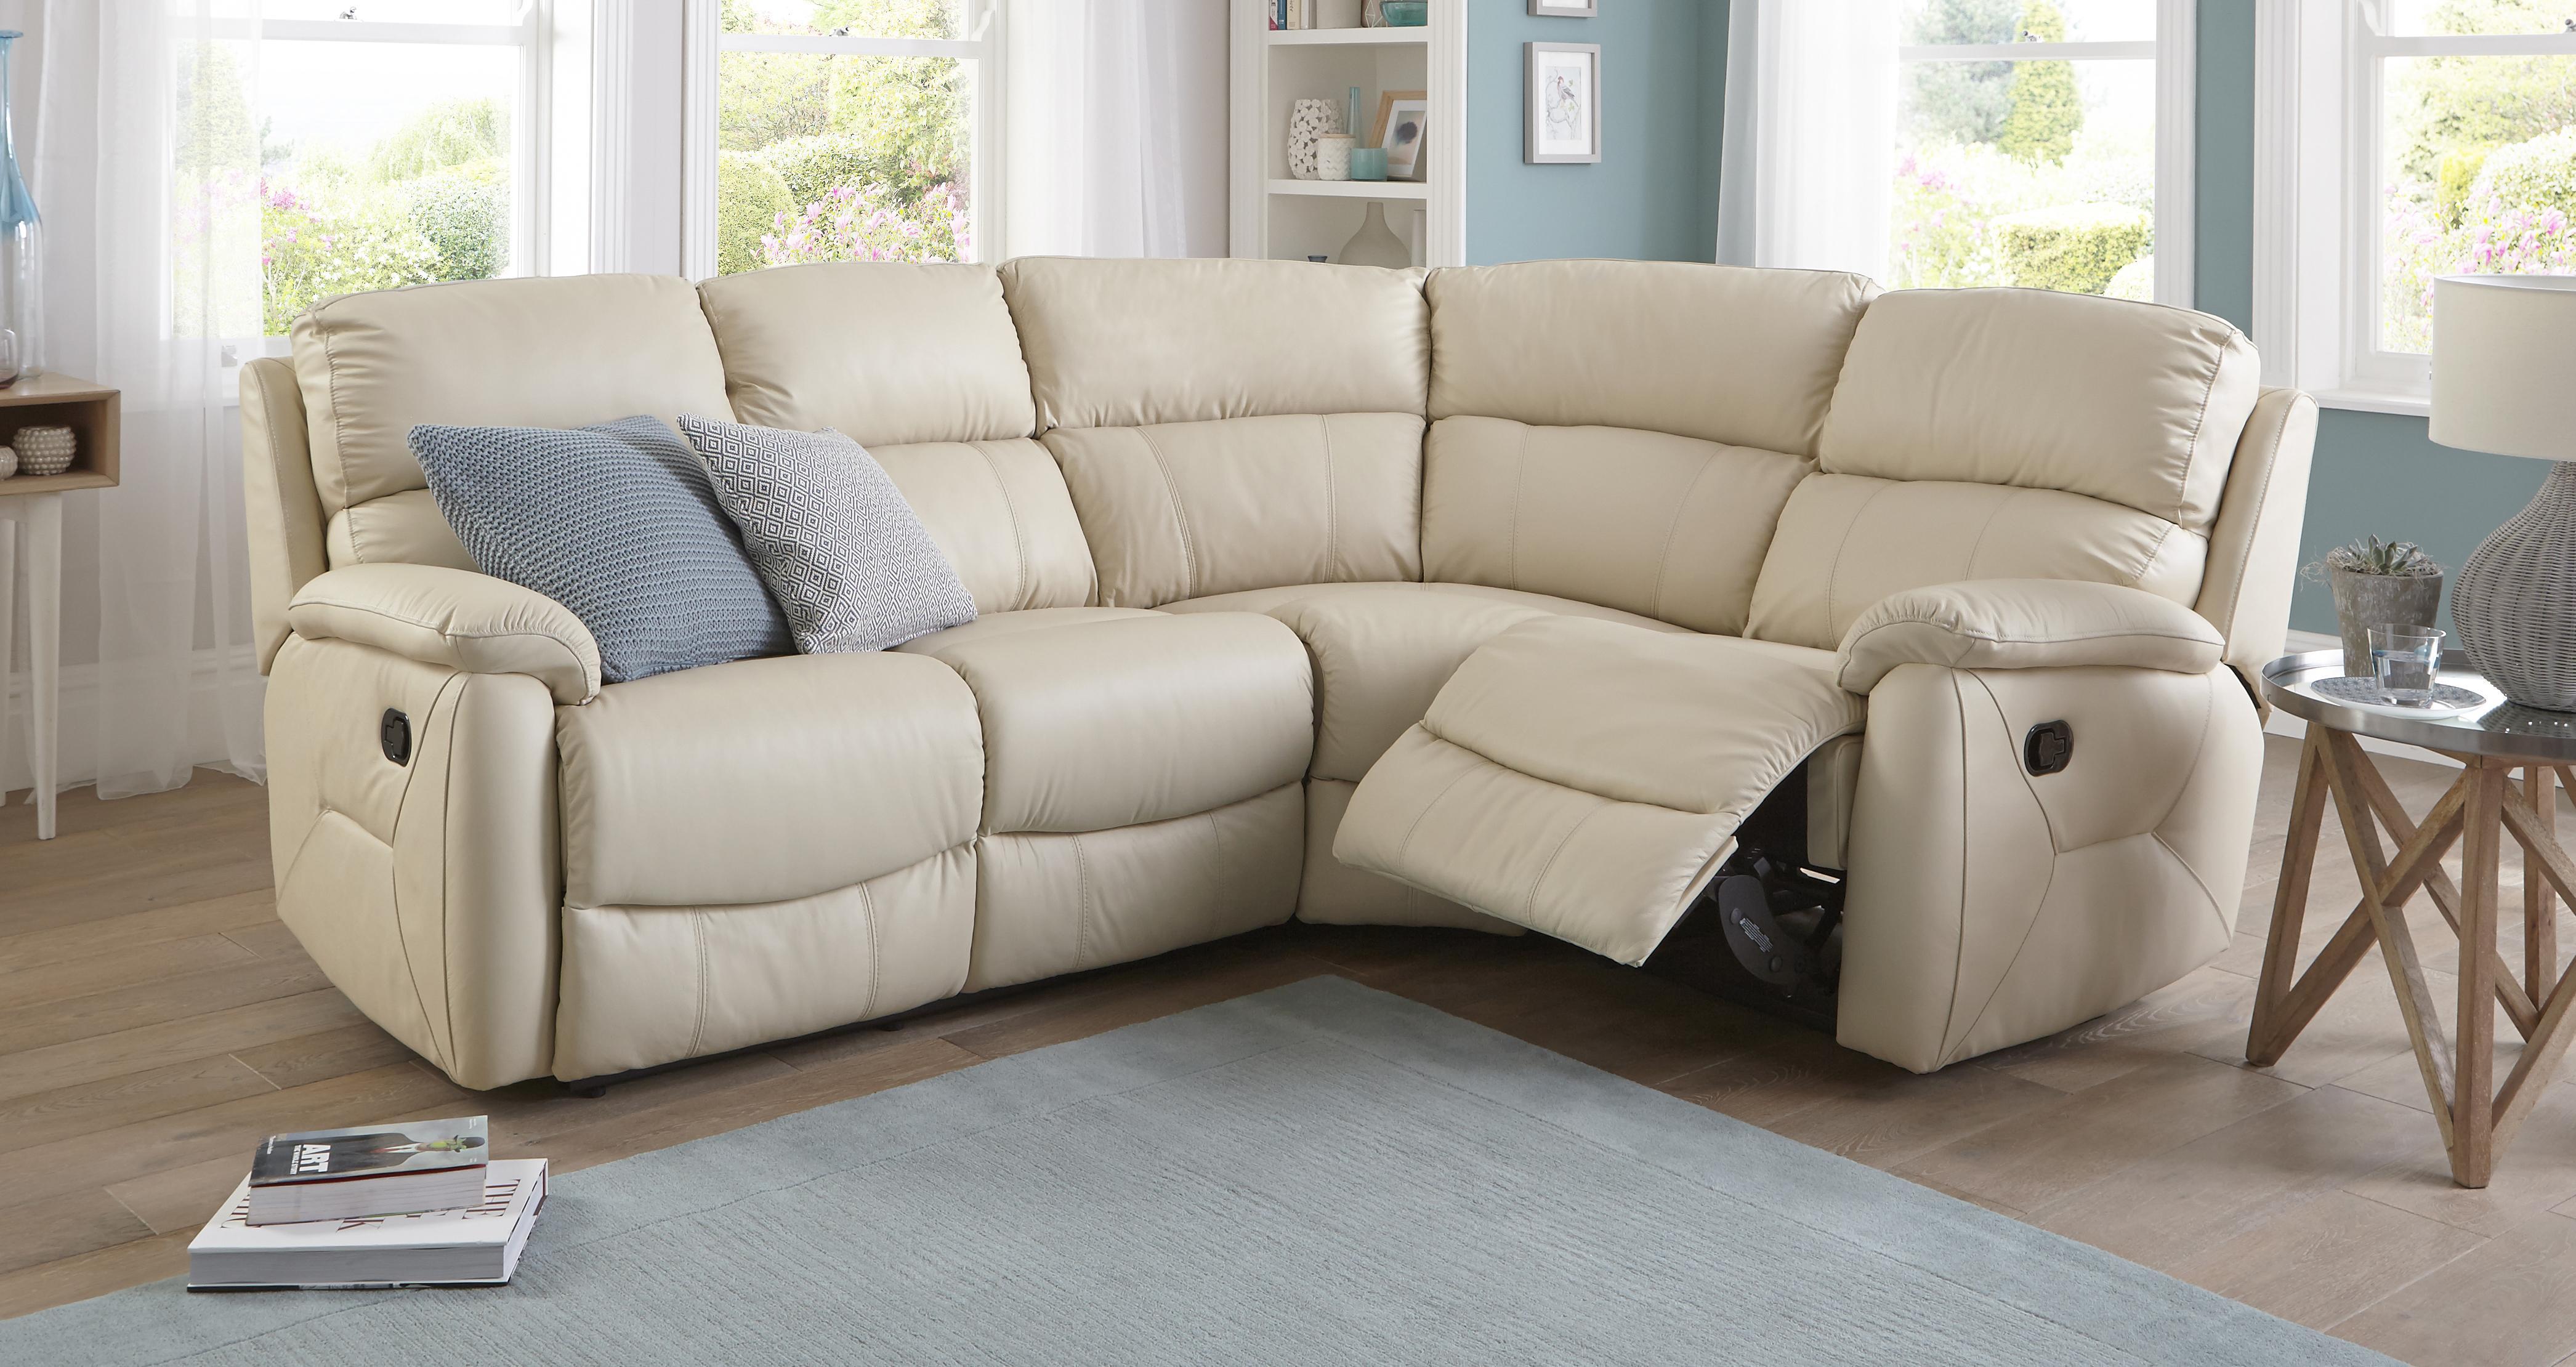 dfs navona sofa reviews cama tipo para perros gradschoolfairs